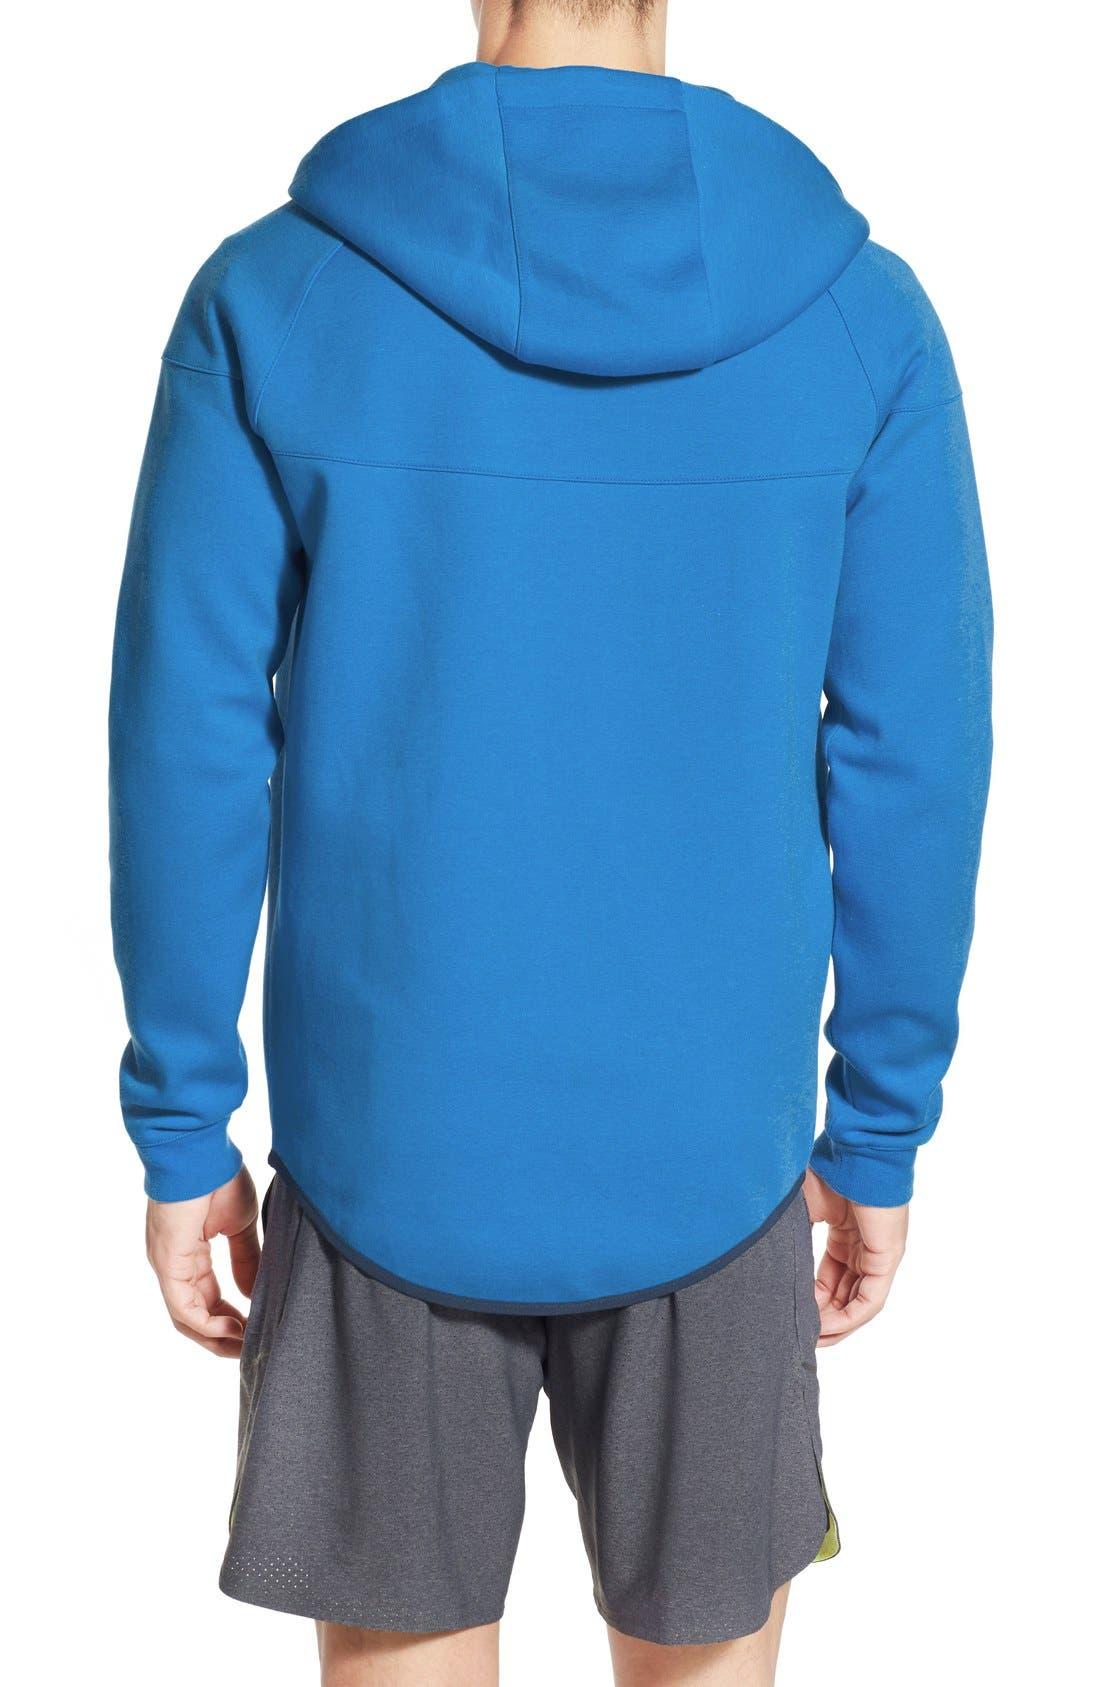 Alternate Image 2  - Nike Water Repellent Tech Fleece Windrunner Jacket